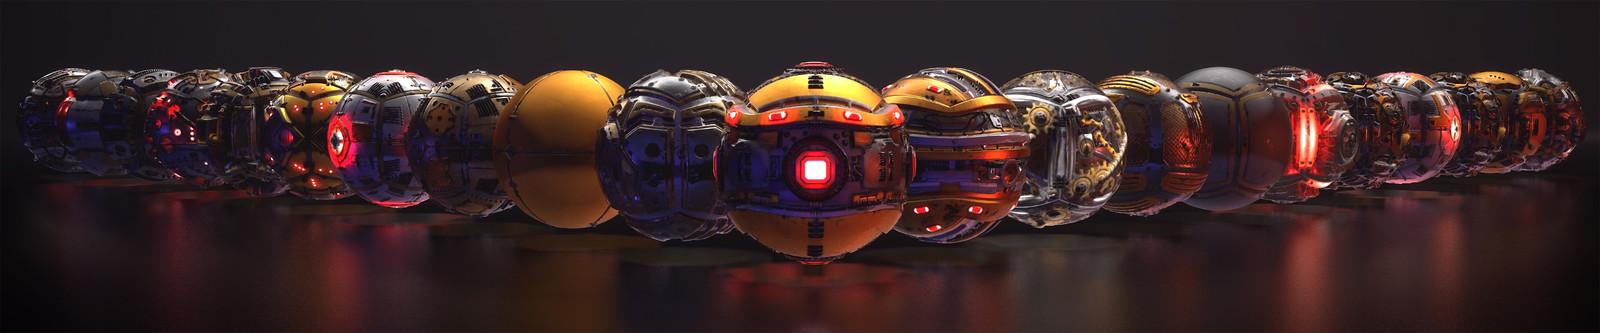 SciFi Texture Megapack Vol. 01 Marmoset renders